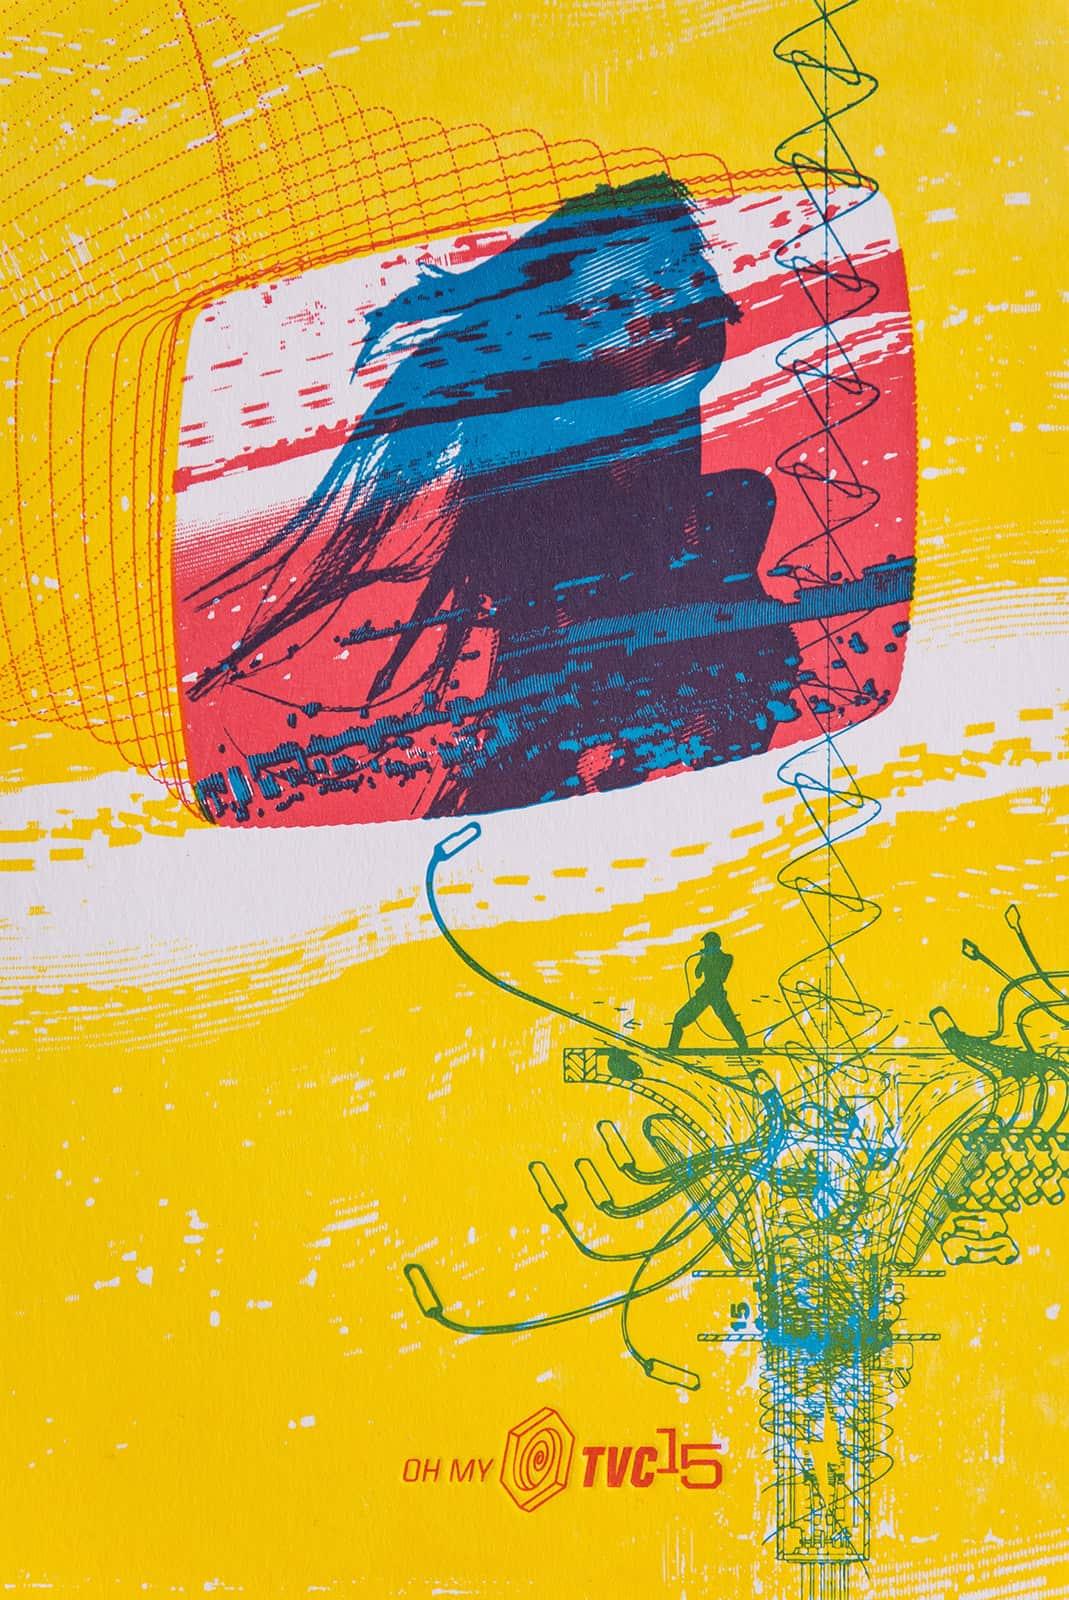 Bowie-Art-Print-Letterpress-tvc15-0